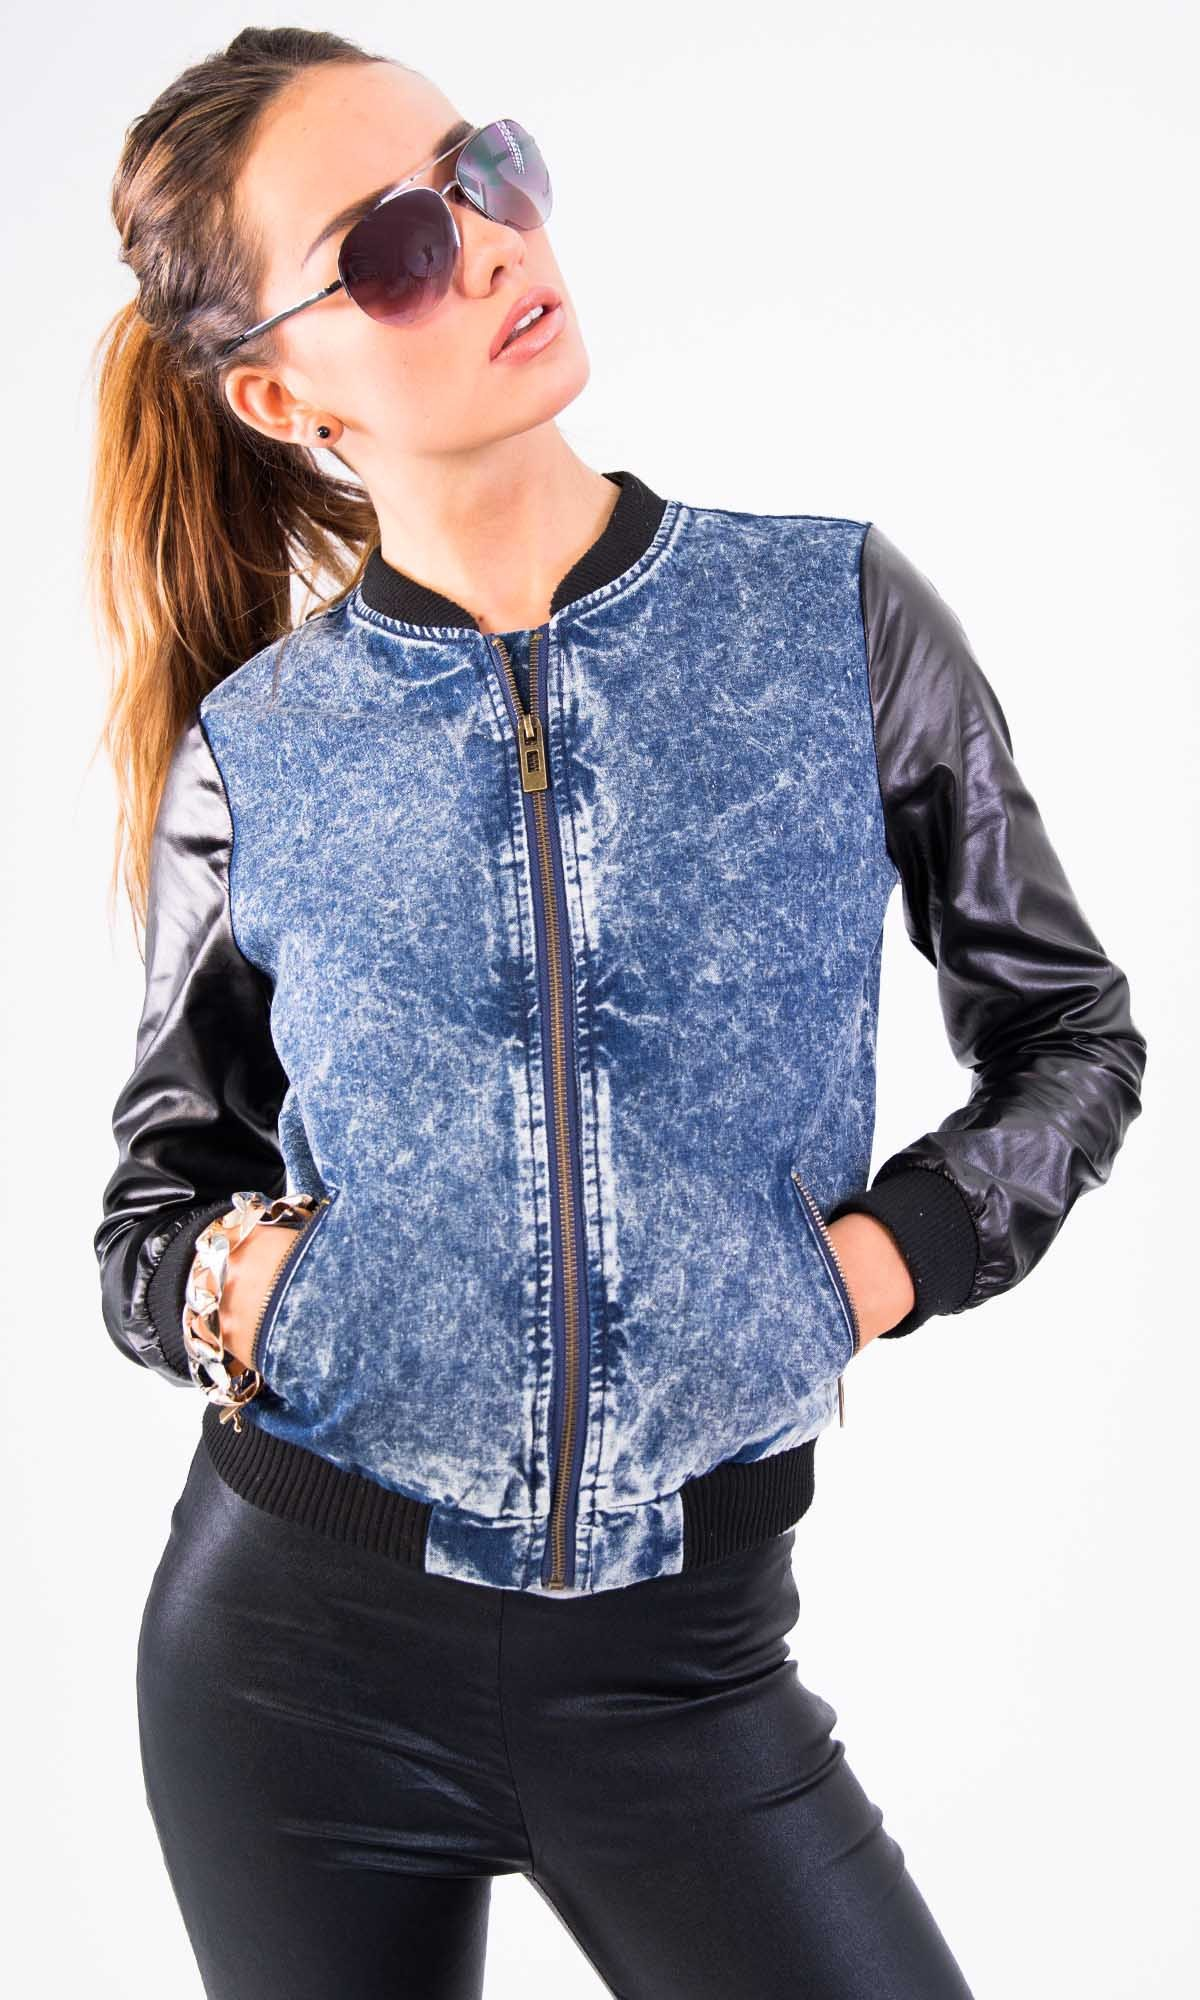 Clothing | Women's Fashion | hiddenfashion.com Collarless PU ...